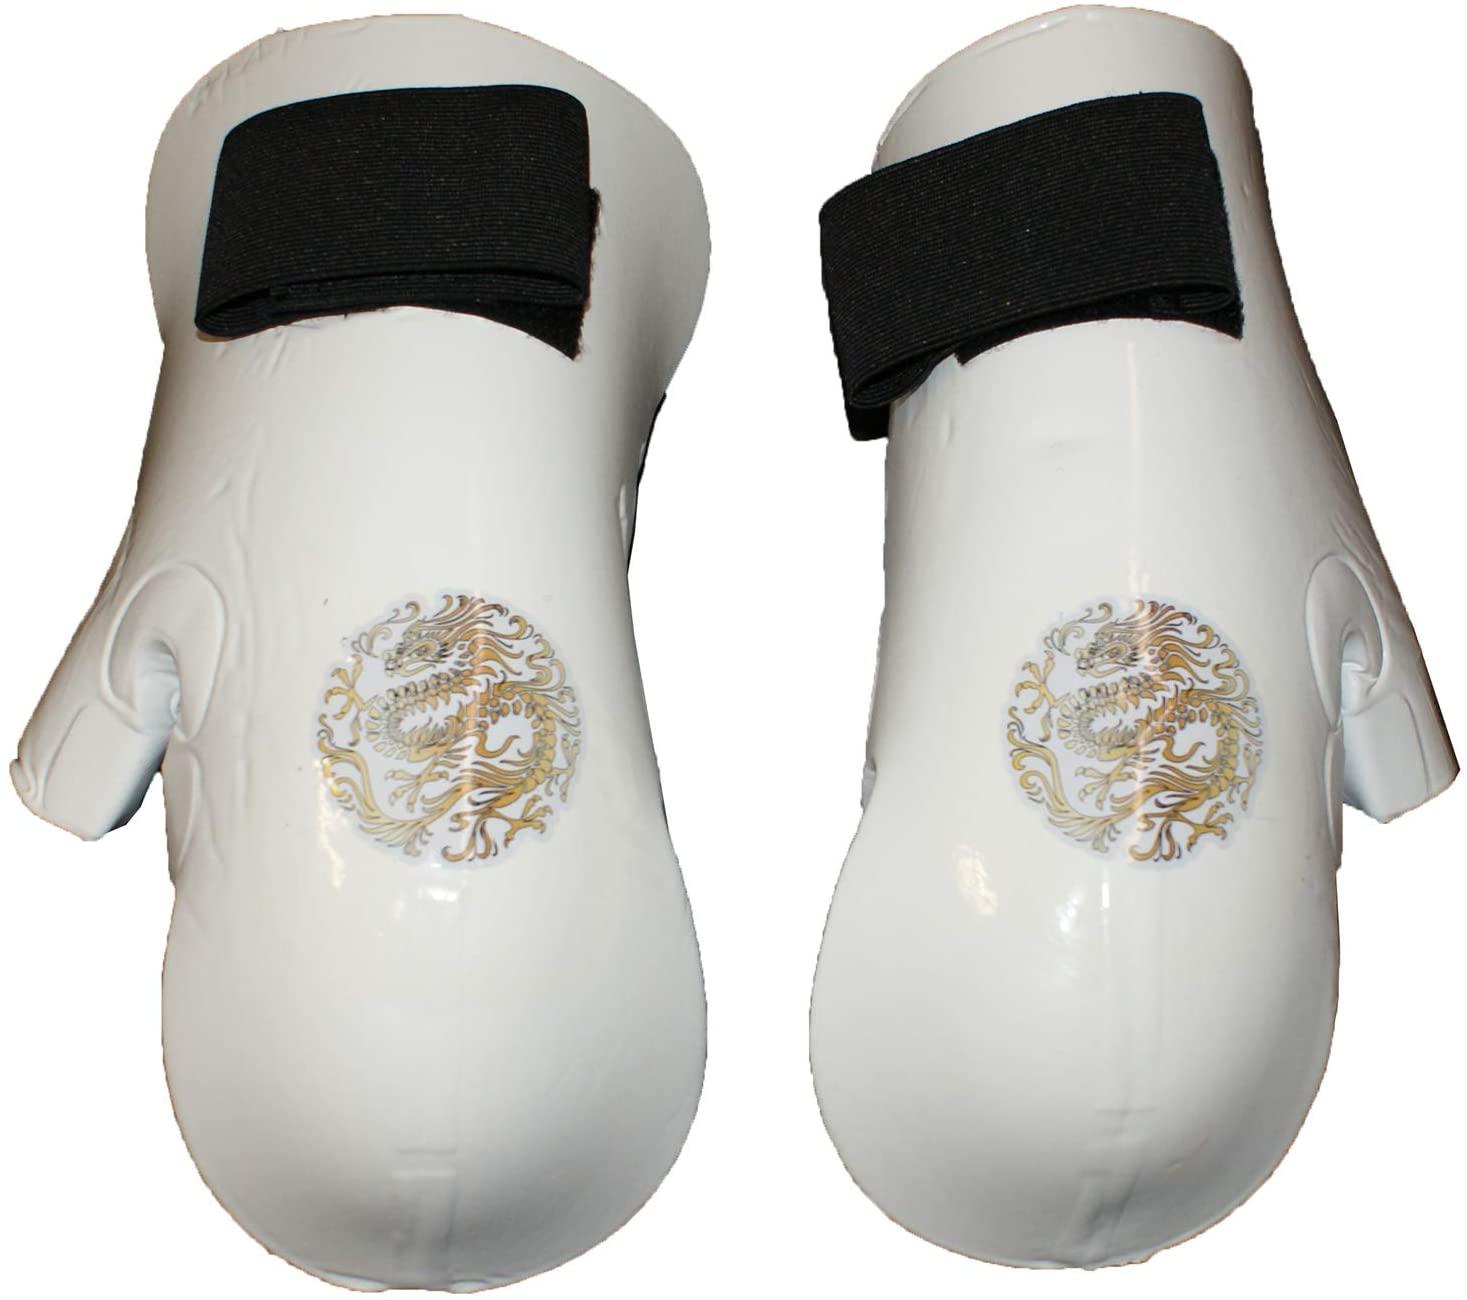 Asian Zing Macho White Punch Child Medium with Dragon Emblem